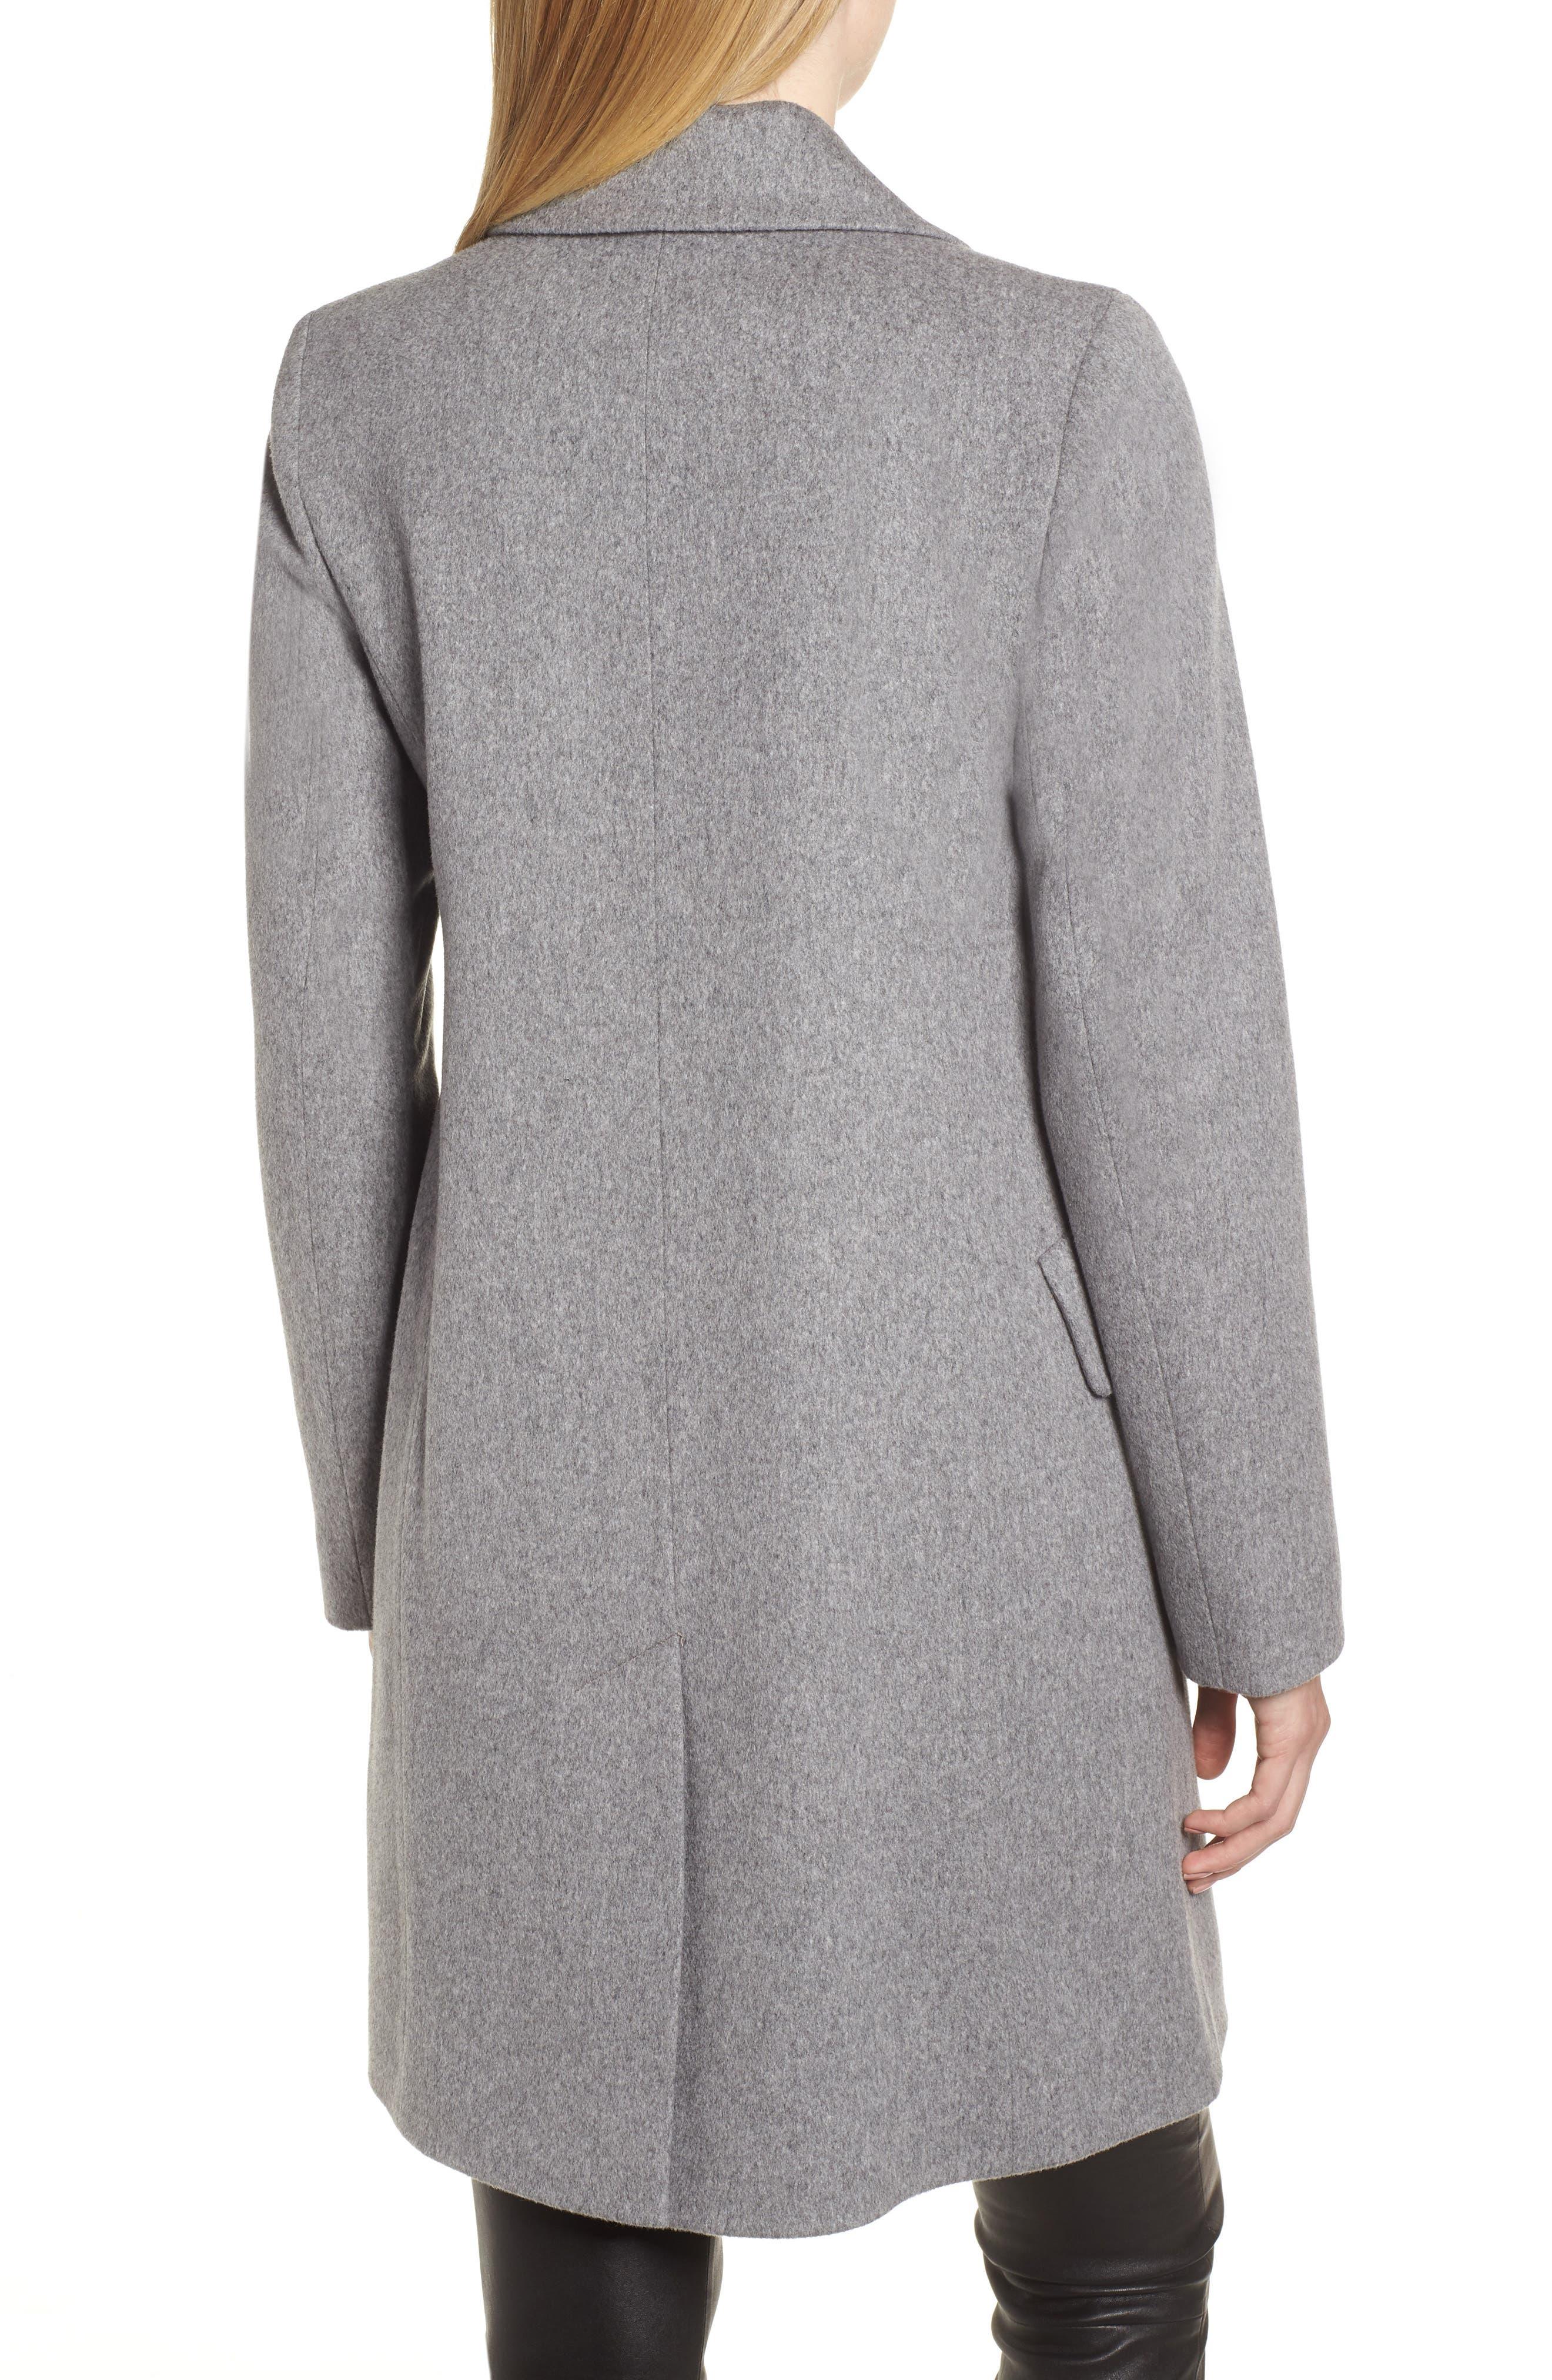 Notch Collar Wool Coat,                             Alternate thumbnail 2, color,                             GREY HEATHER